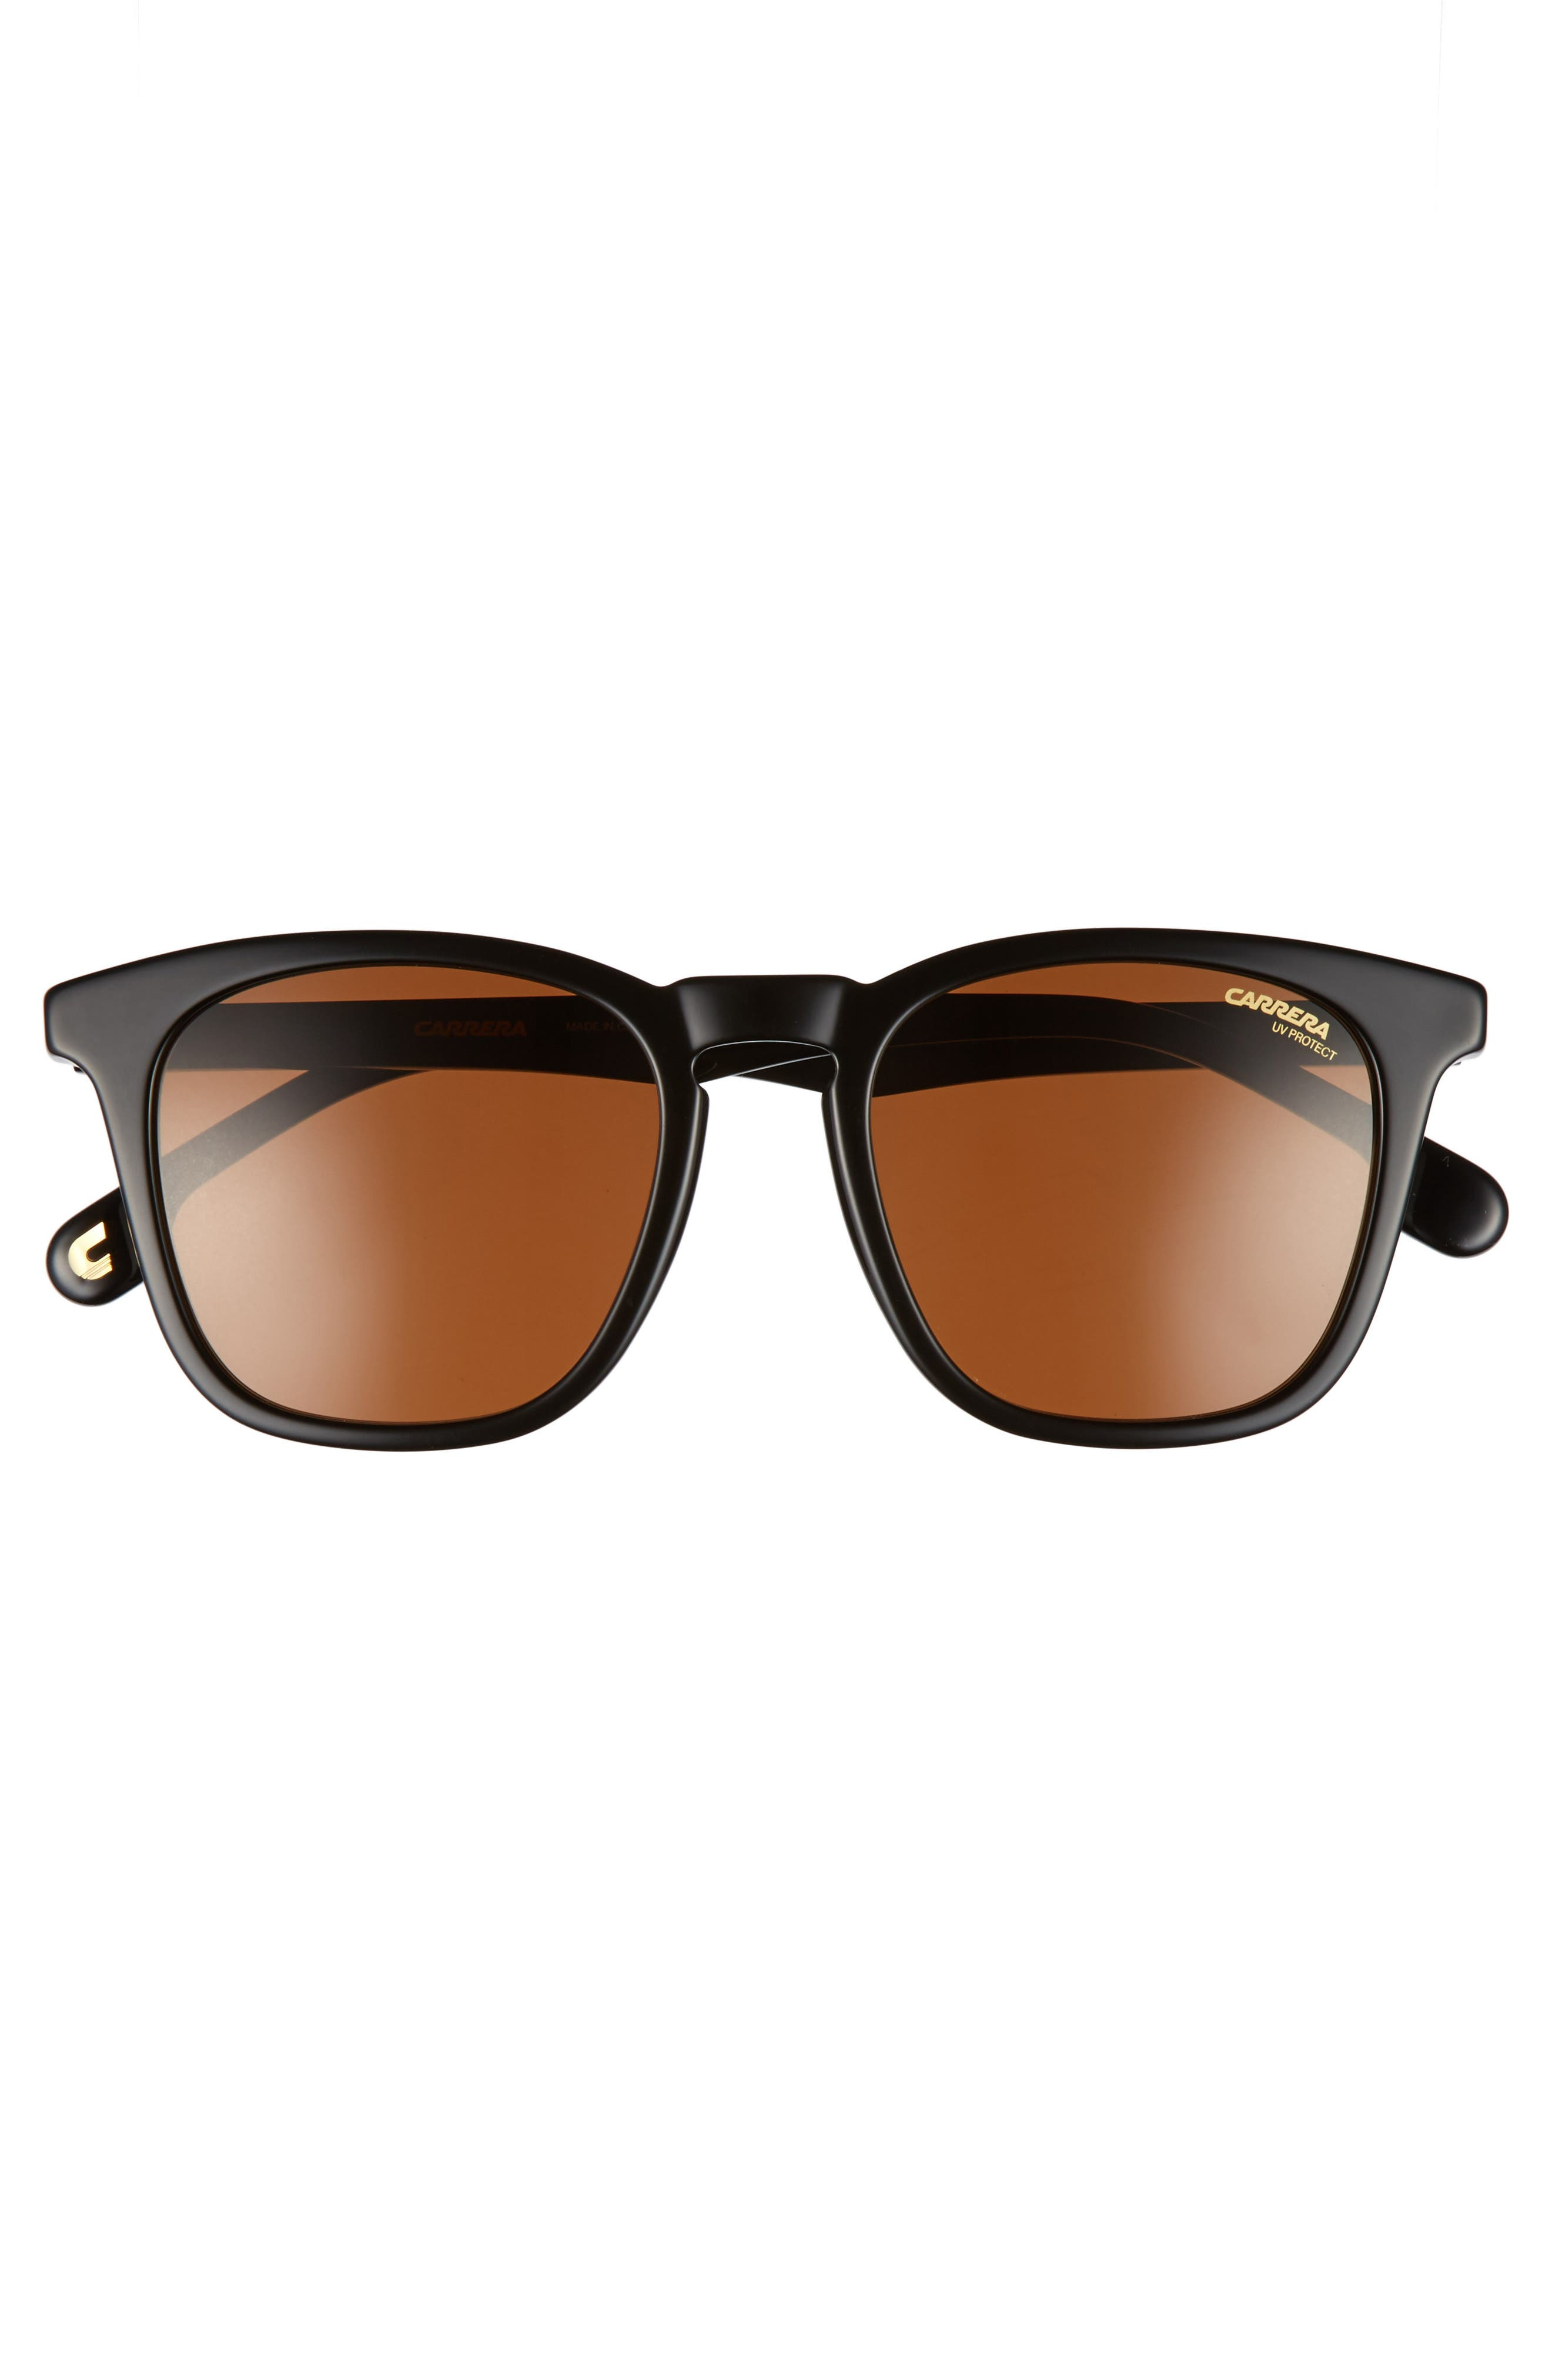 Carrera 143S 51mm Sunglasses,                             Alternate thumbnail 2, color,                             BLACK/ BROWN